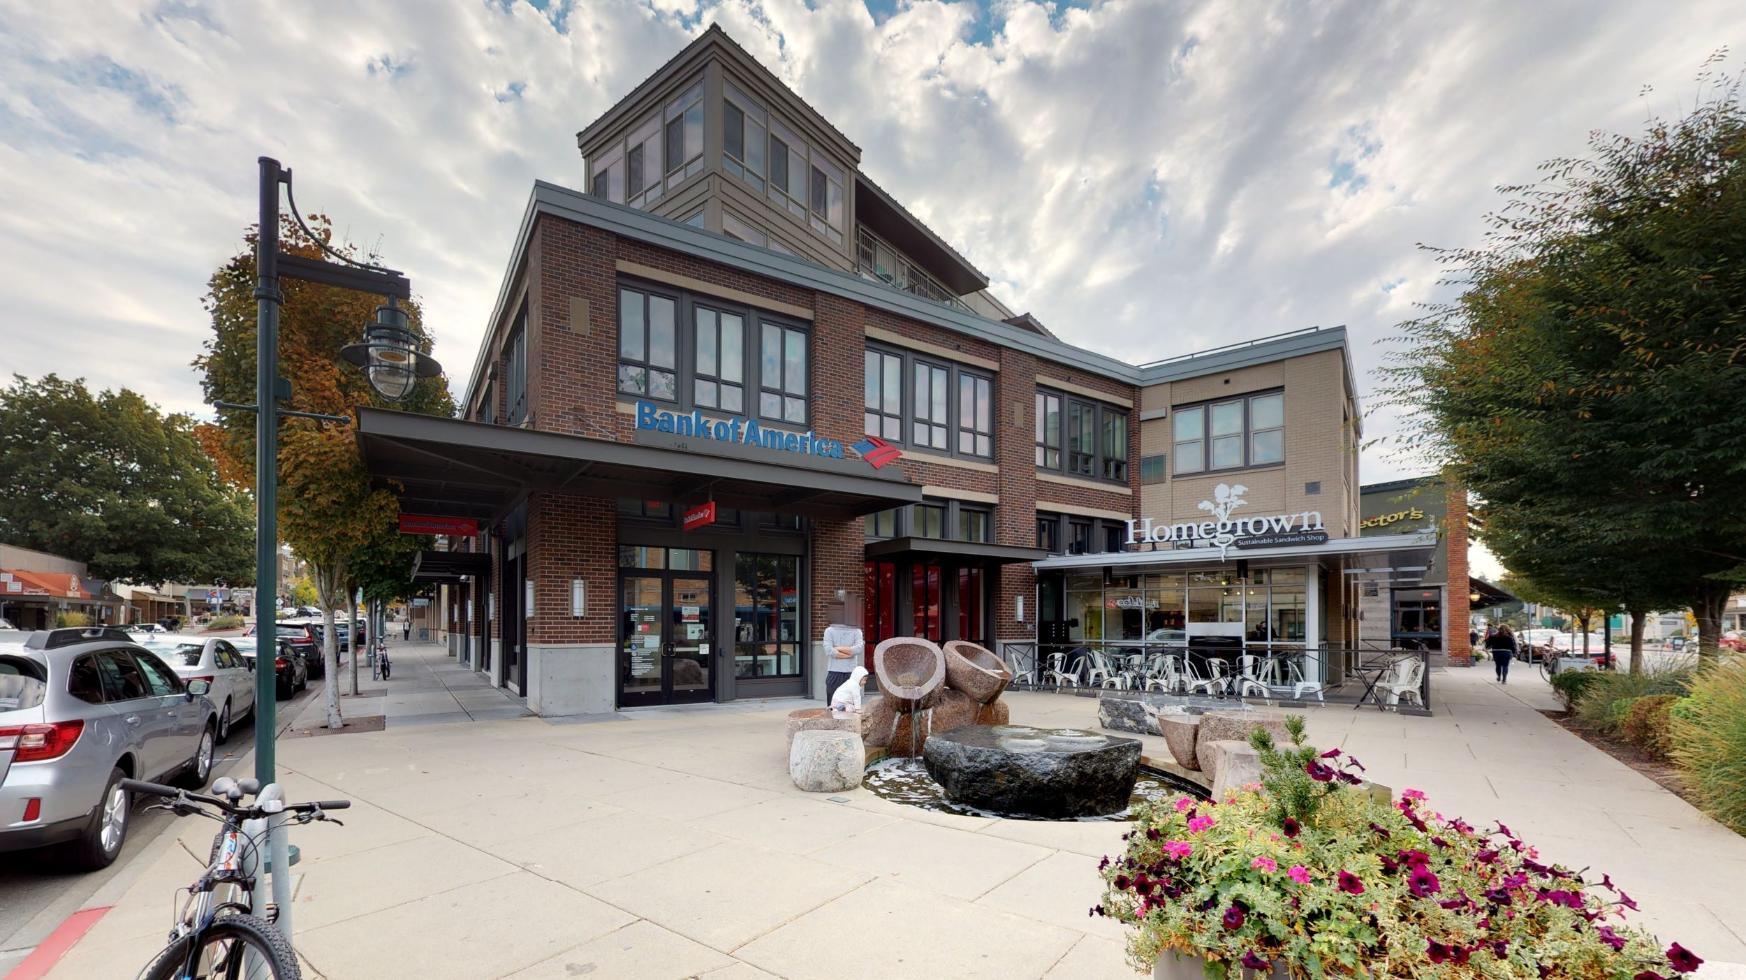 Bank of America financial center with drive-thru ATM | 101 Kirkland Ave, Kirkland, WA 98033